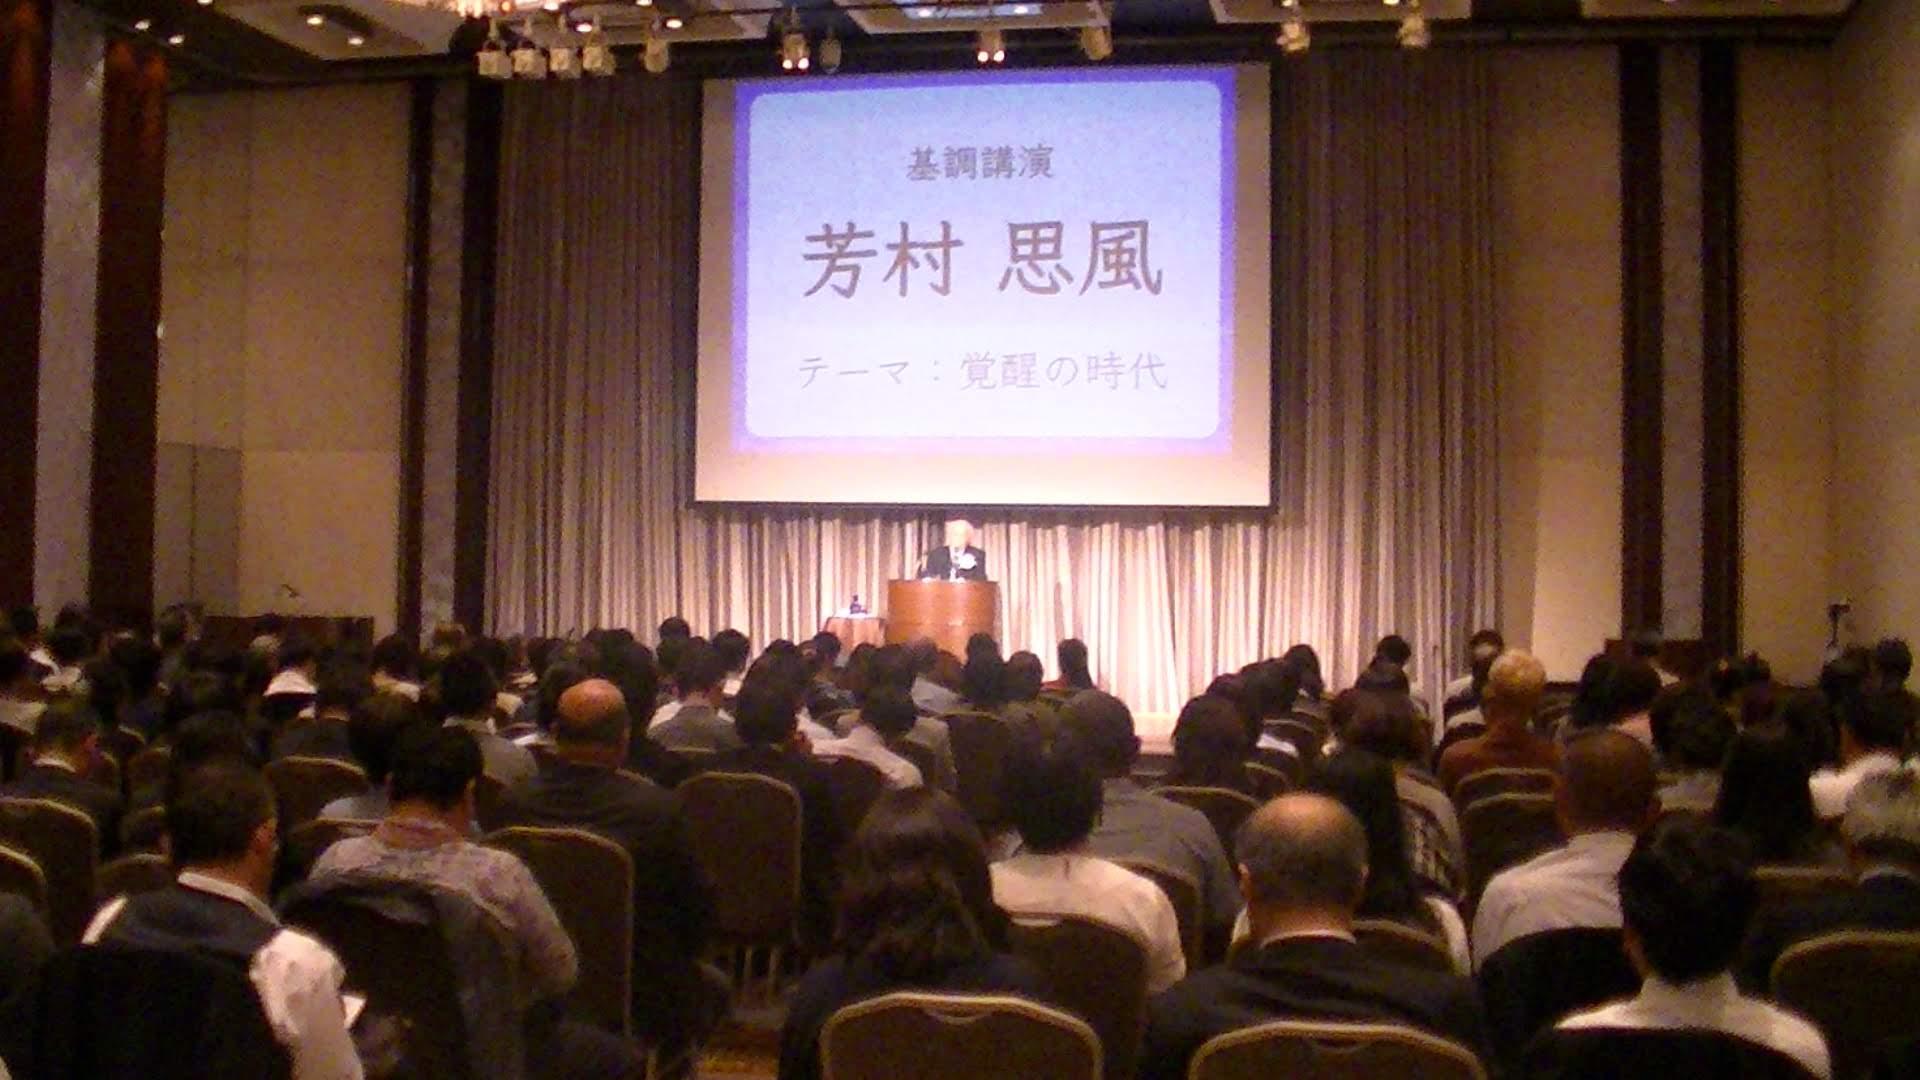 PIC 1712 1 - 思風会全国大会in広島